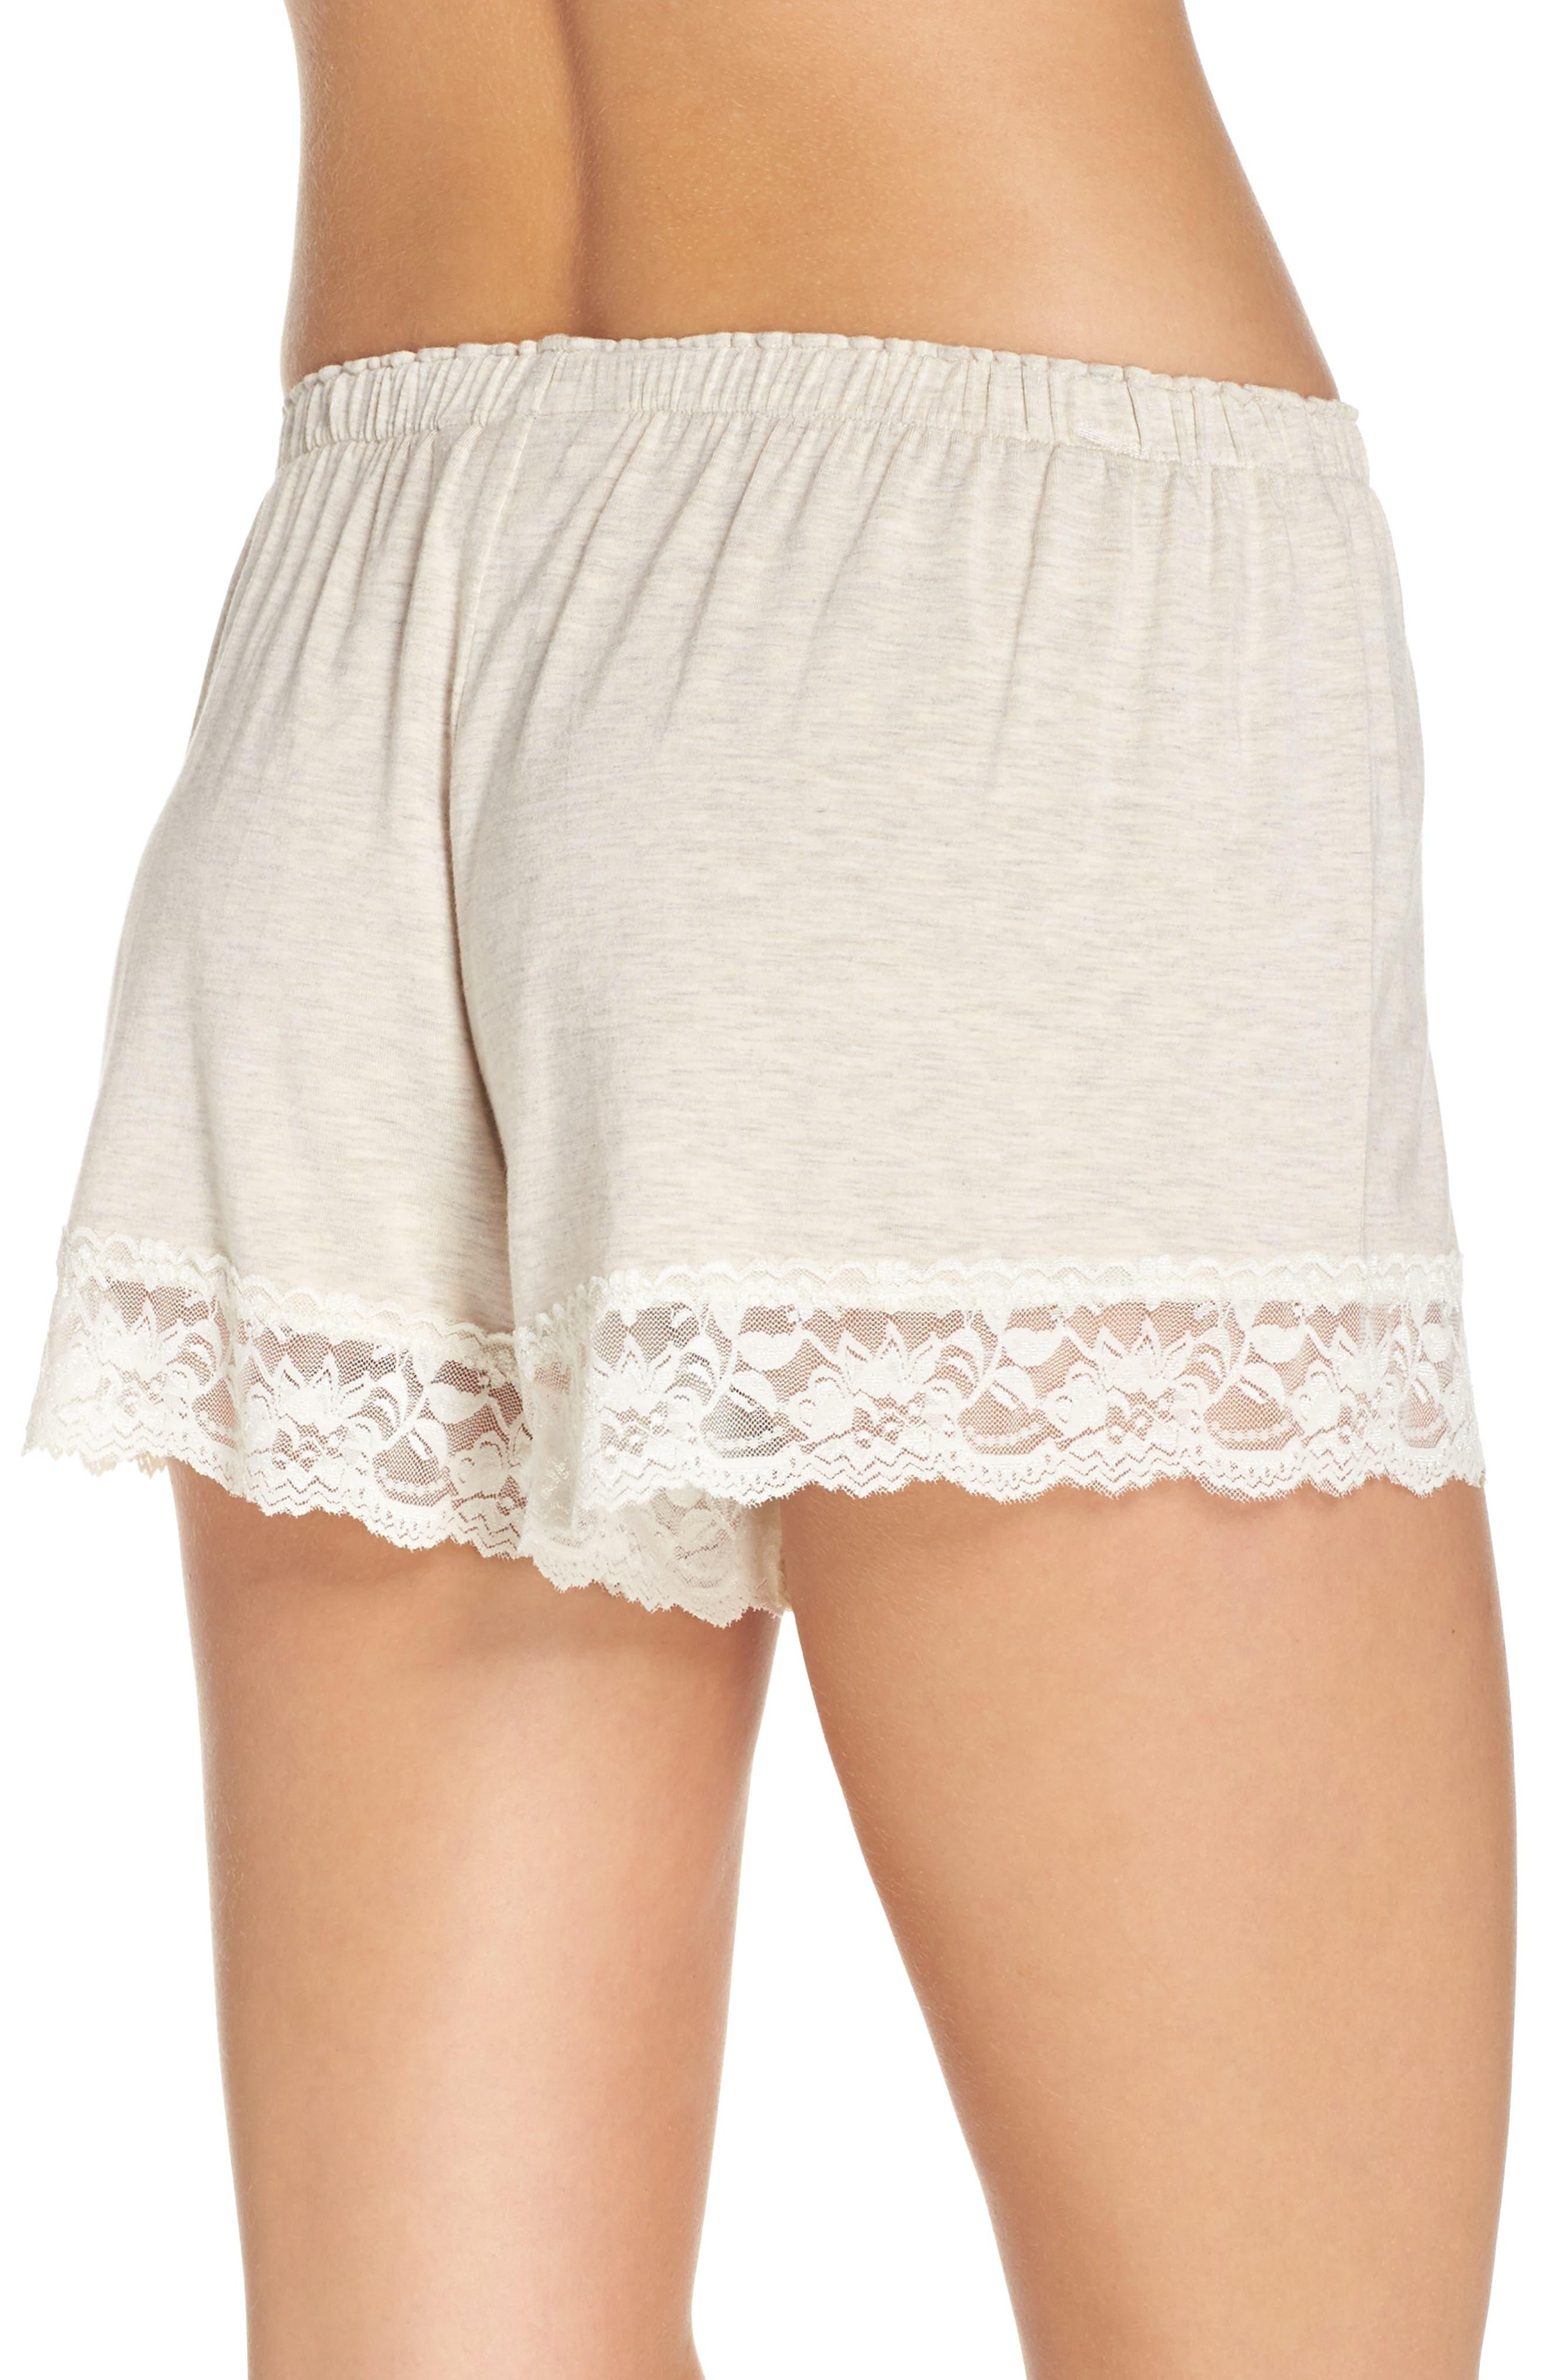 Flora Nikrooz Snuggle Lounge Shorts,                             Alternate thumbnail 3, color,                             Oatmeal